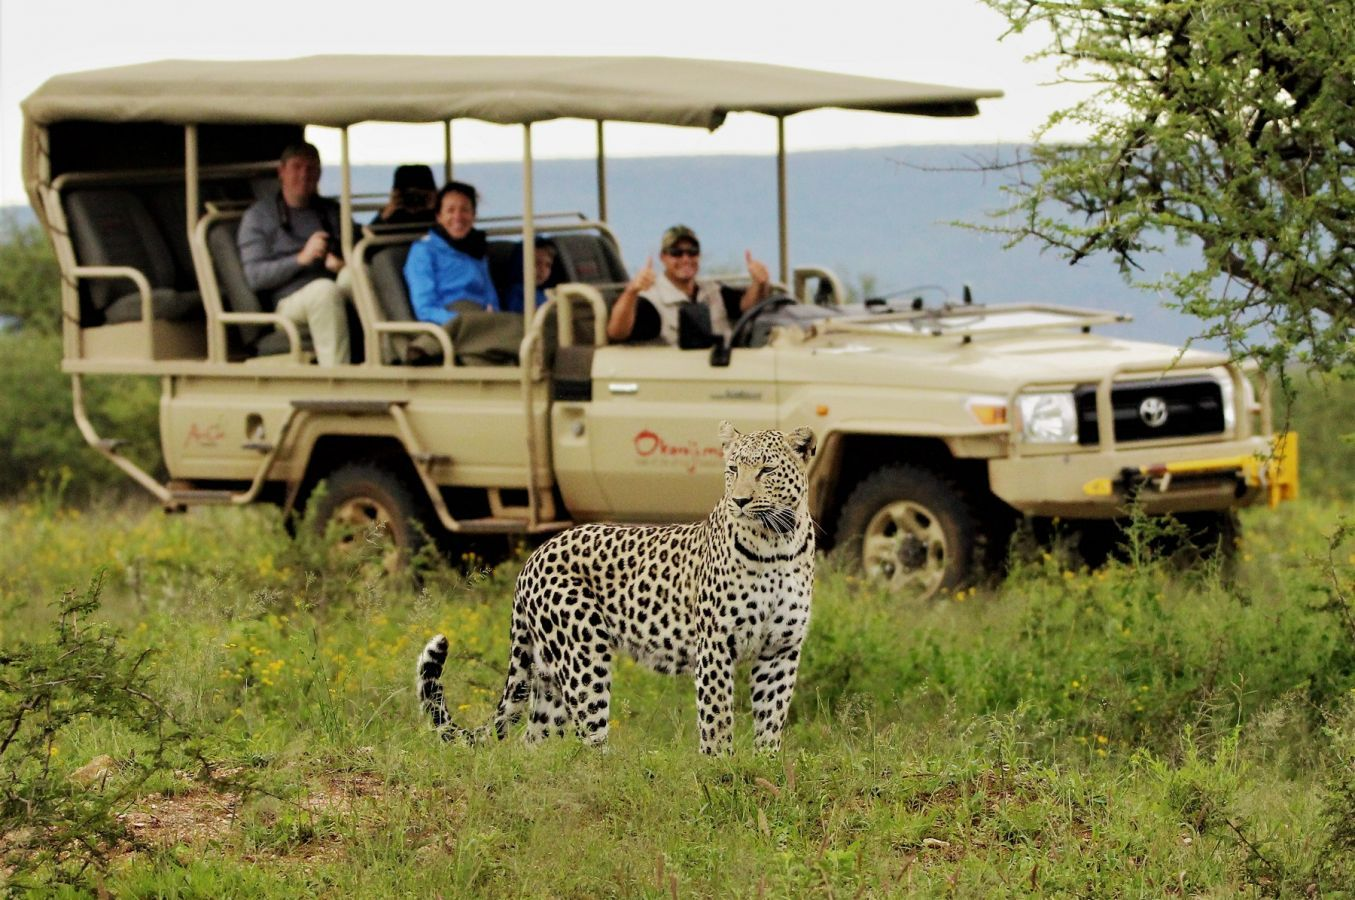 Game drive in Okonjima Nature Reserve